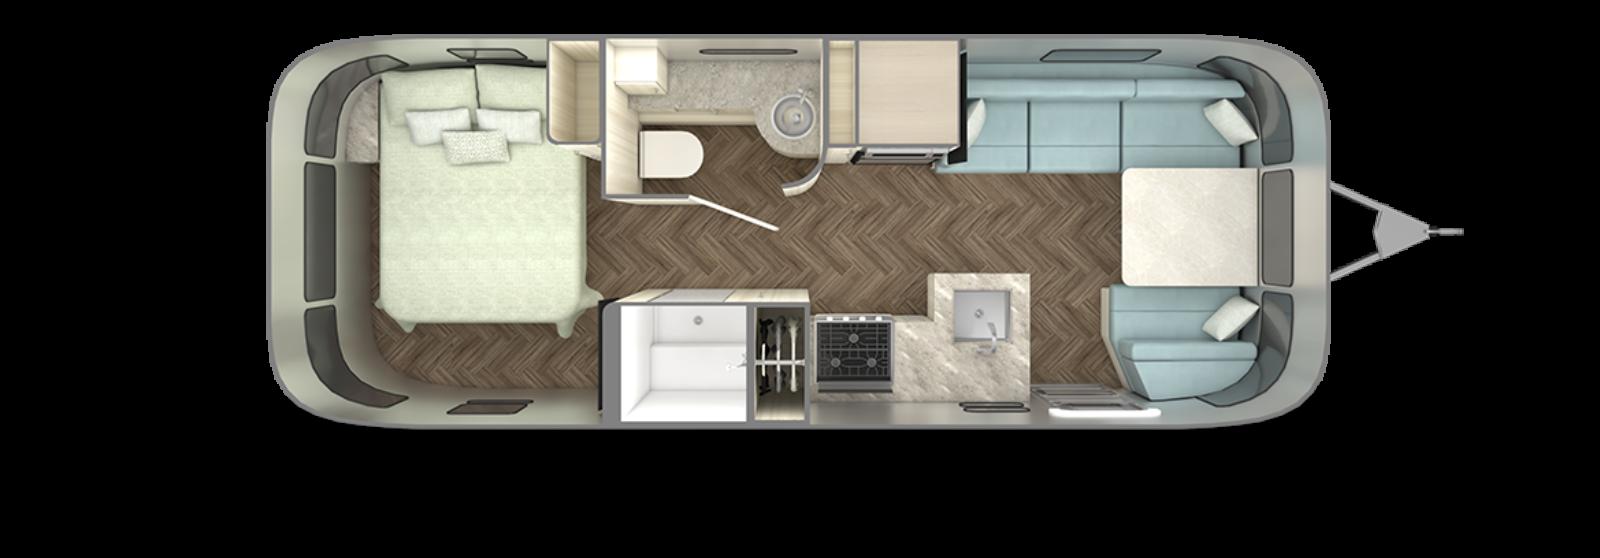 2021-Airstream-International-25RB-floor-plan-aqua